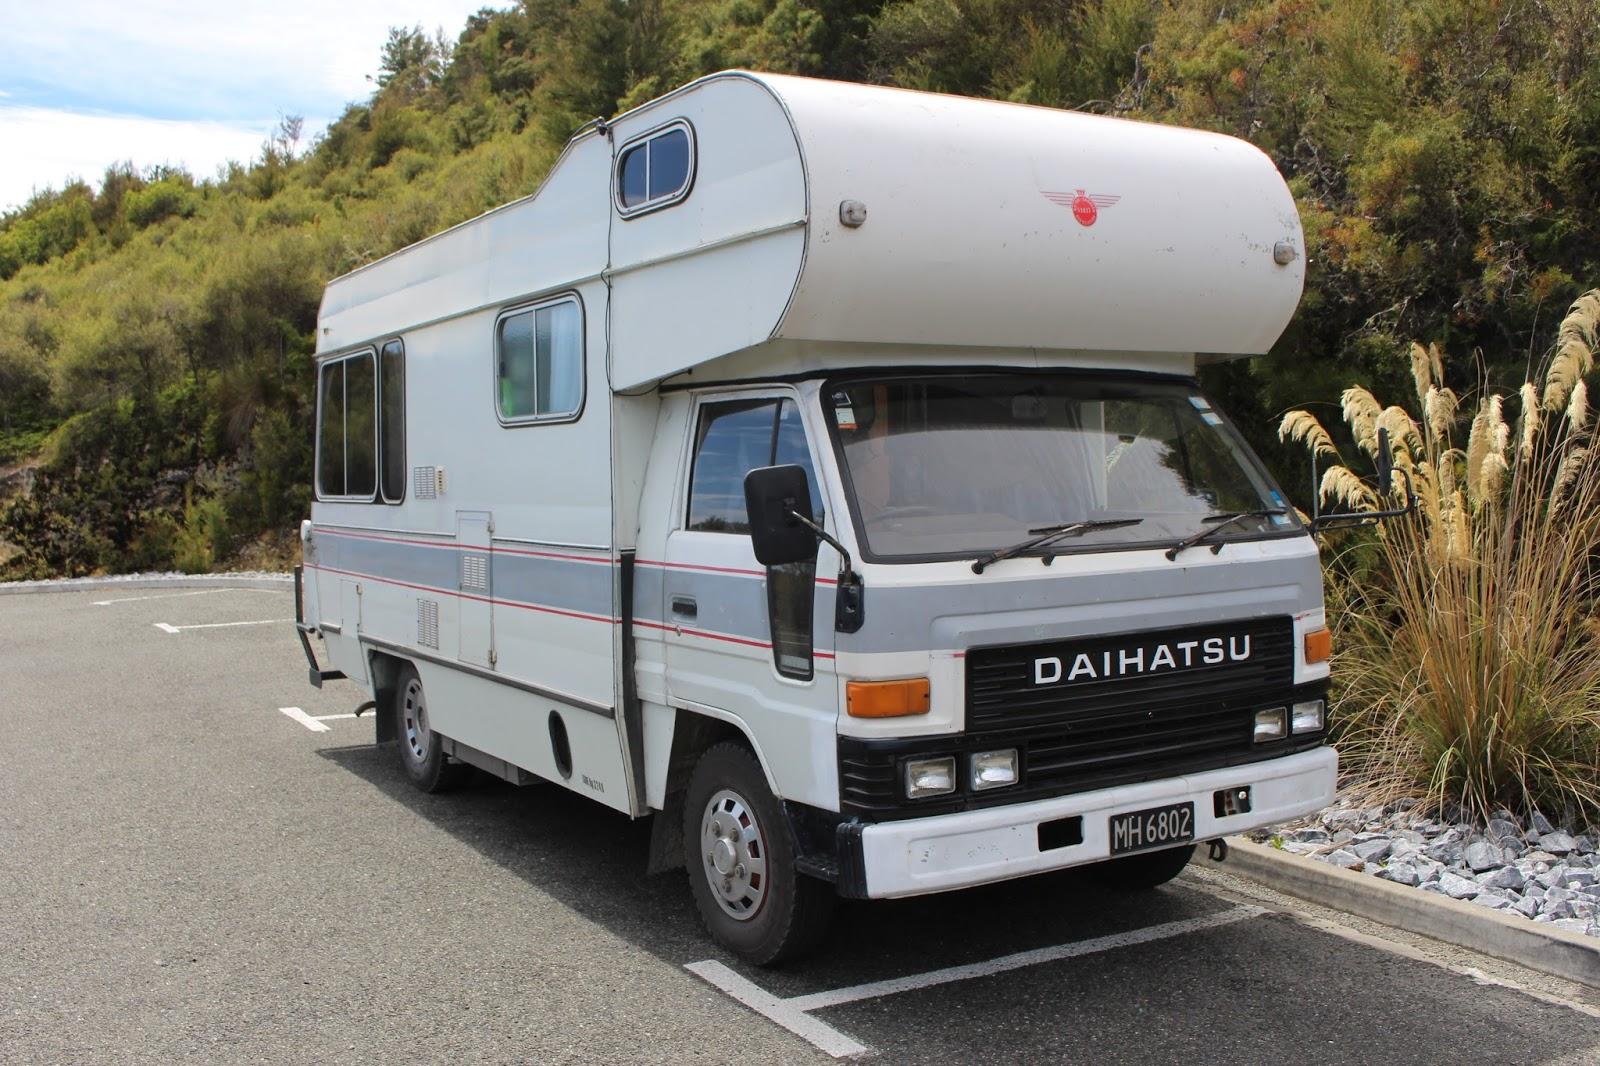 jali s journey for sale daihatsu delta v76 4 berth motorhome rh jalisjourney blogspot com